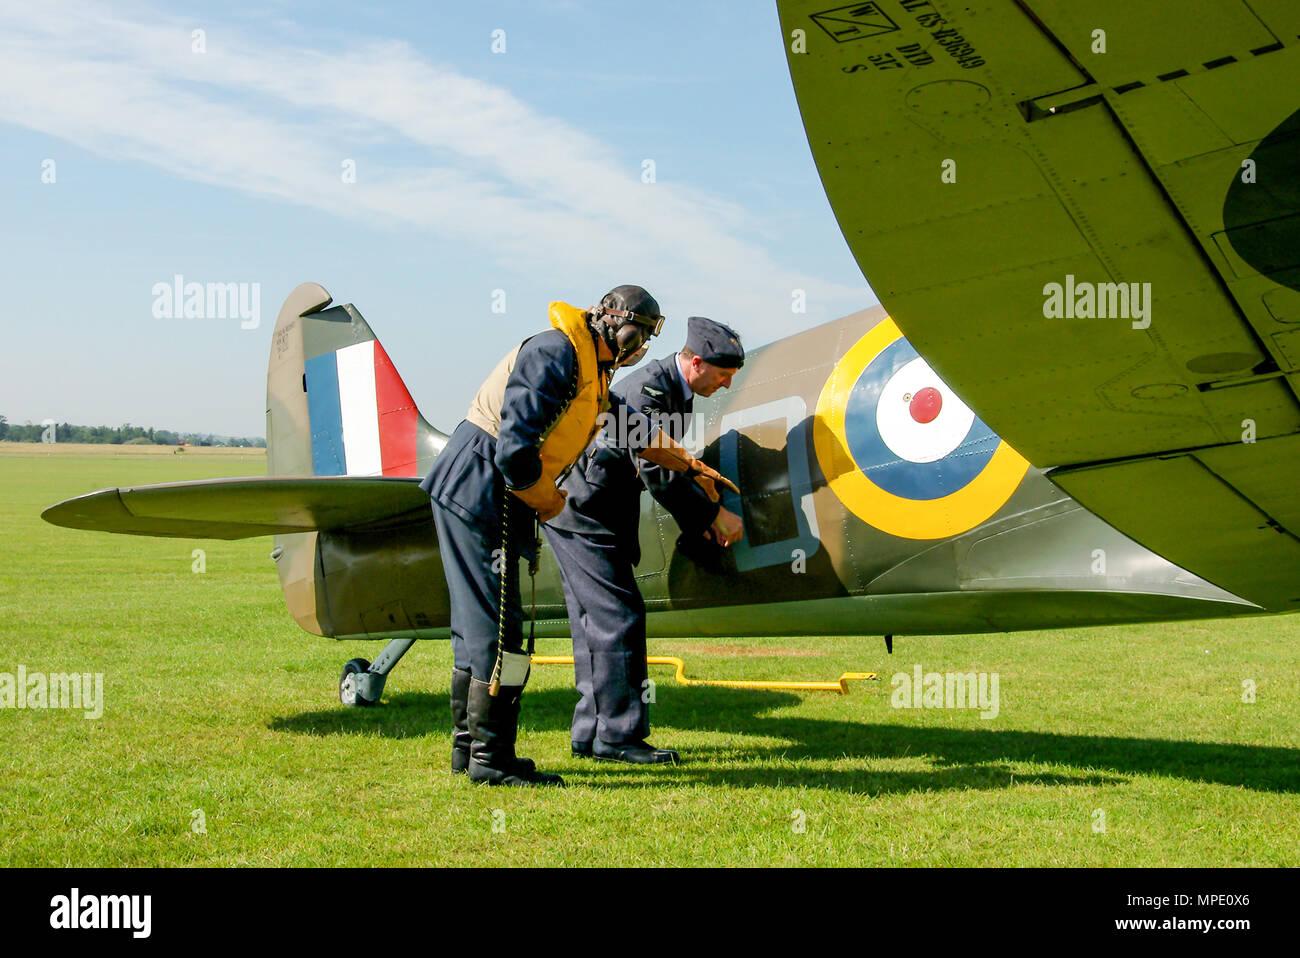 battle-of-britain-era-spitfire-mk1-with-pilot-ground-crew-engineer-re-enactors-discussing-apparent-battle-damage-supermarine-spitfire-mark-1-plane-MPE0X6.jpg